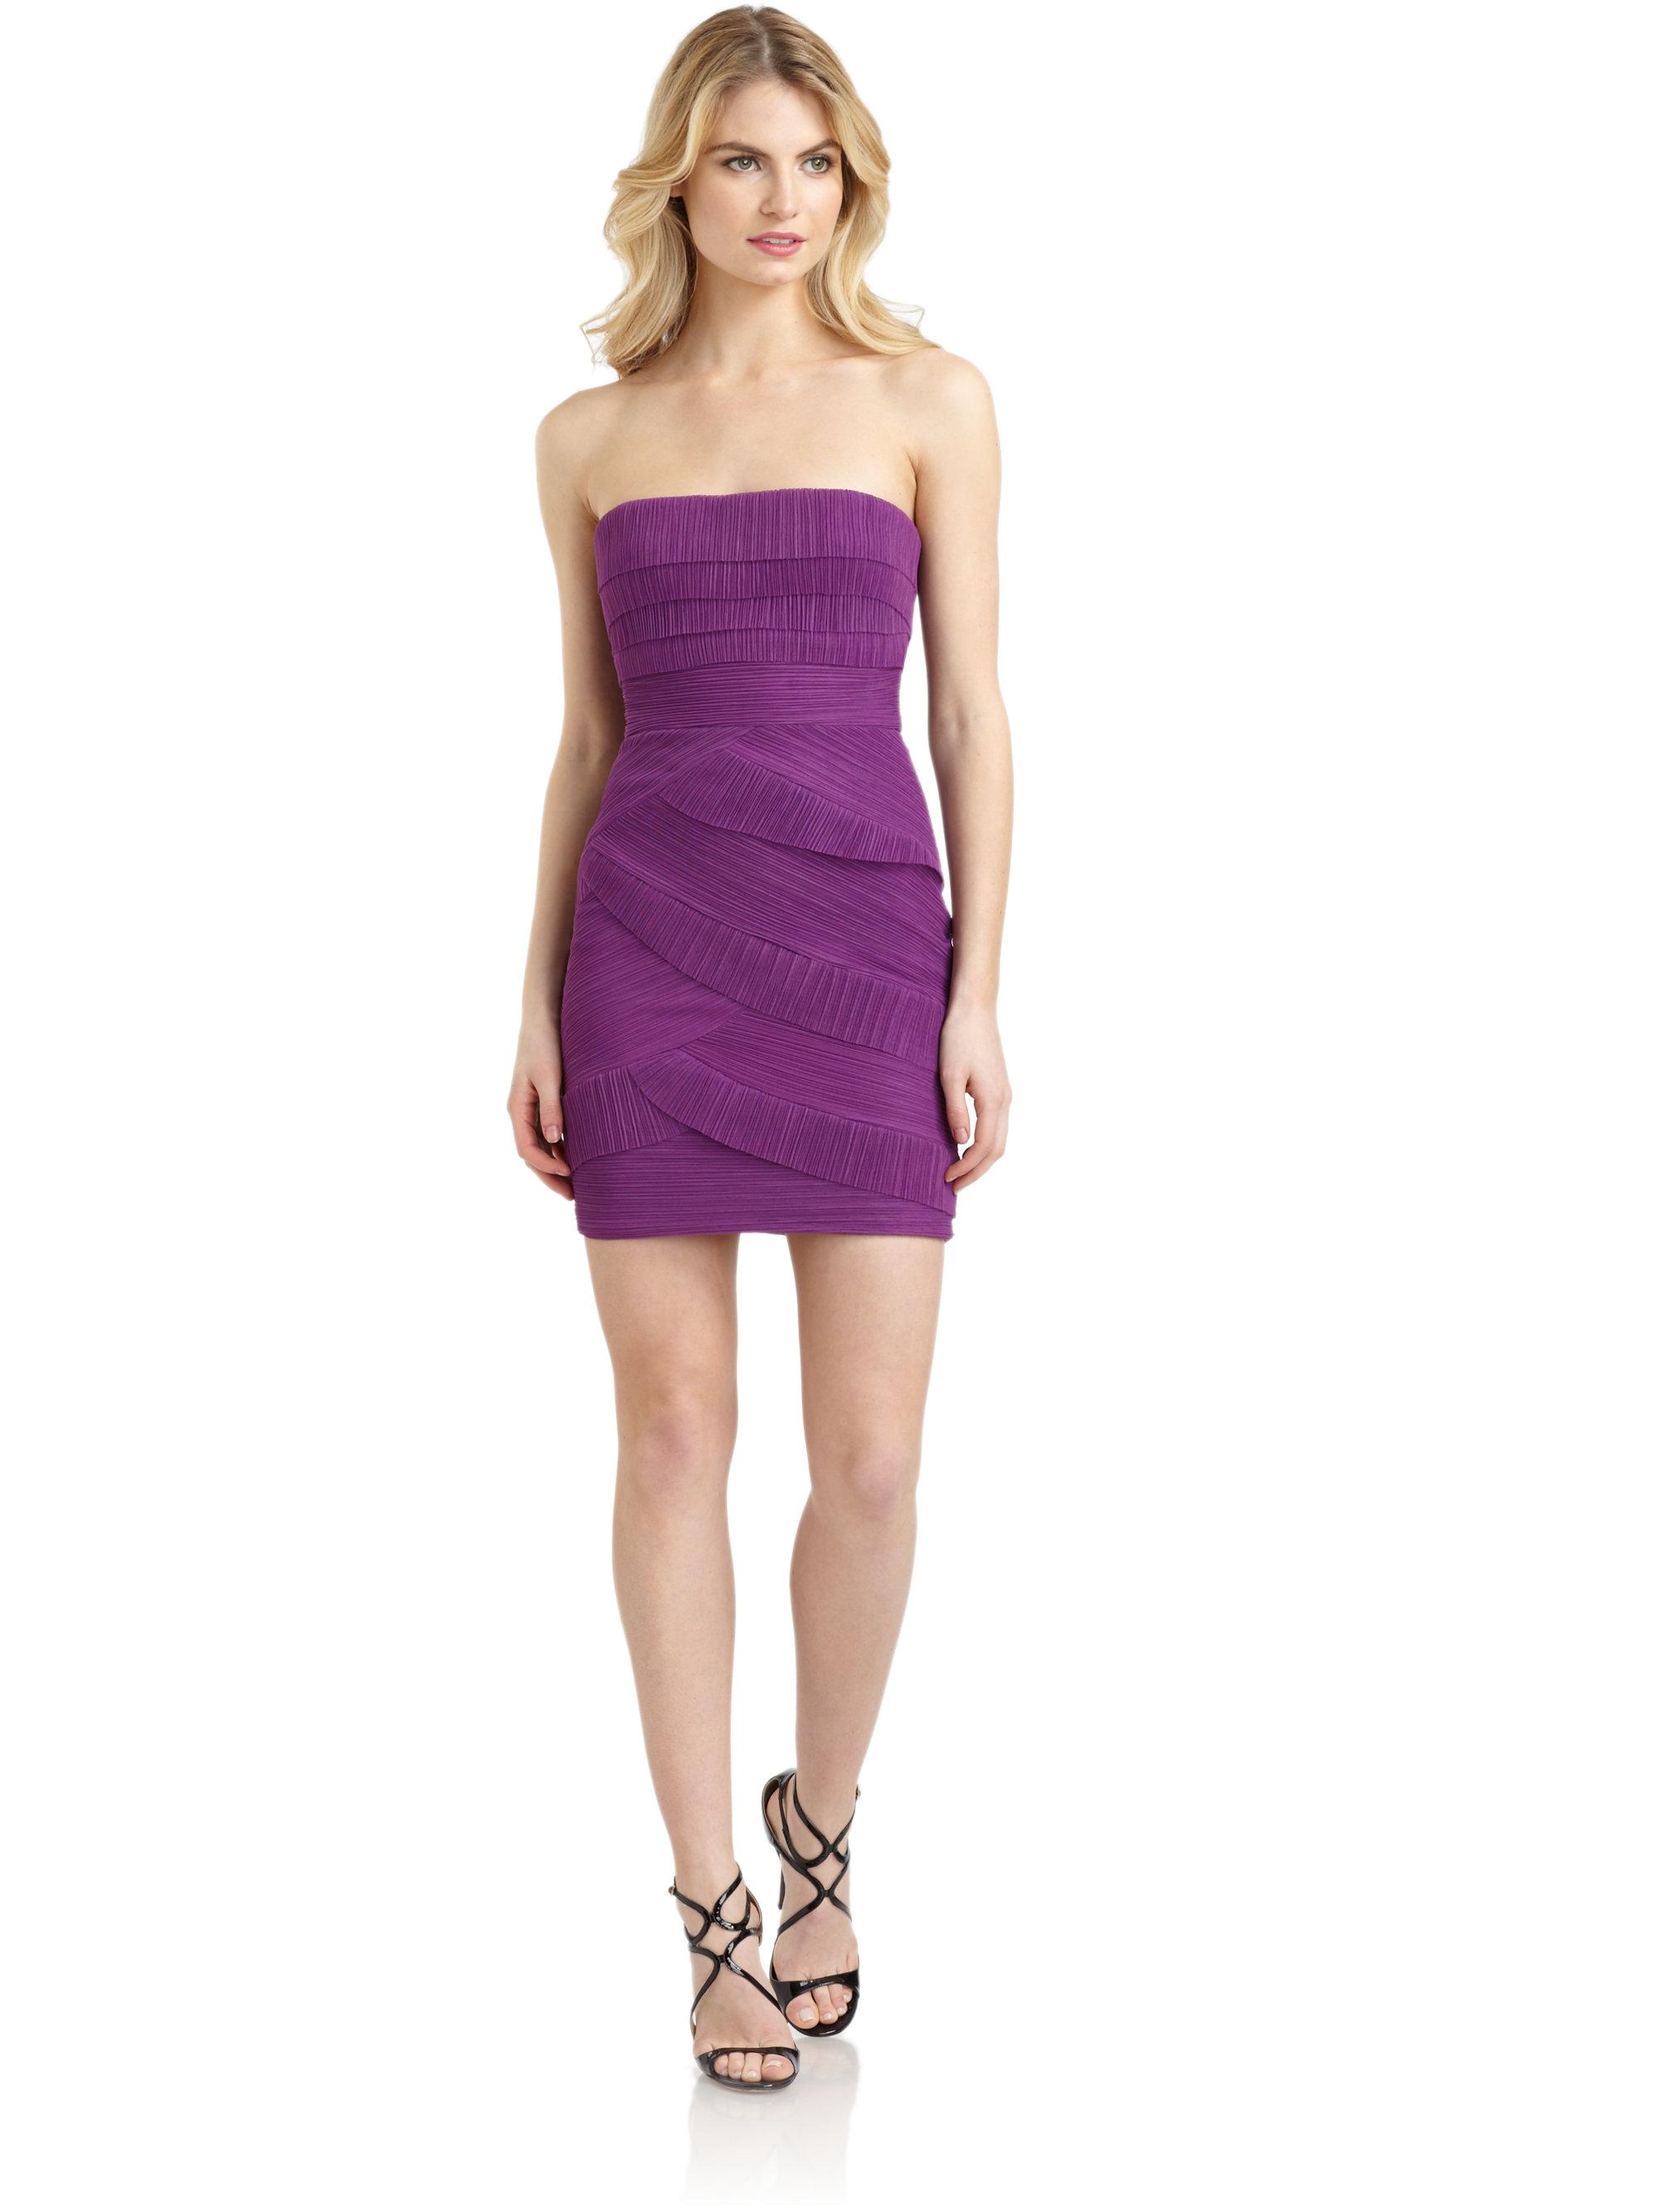 Lyst - Bcbgmaxazria Jorie Pleated Strapless Cocktail Dress in Purple